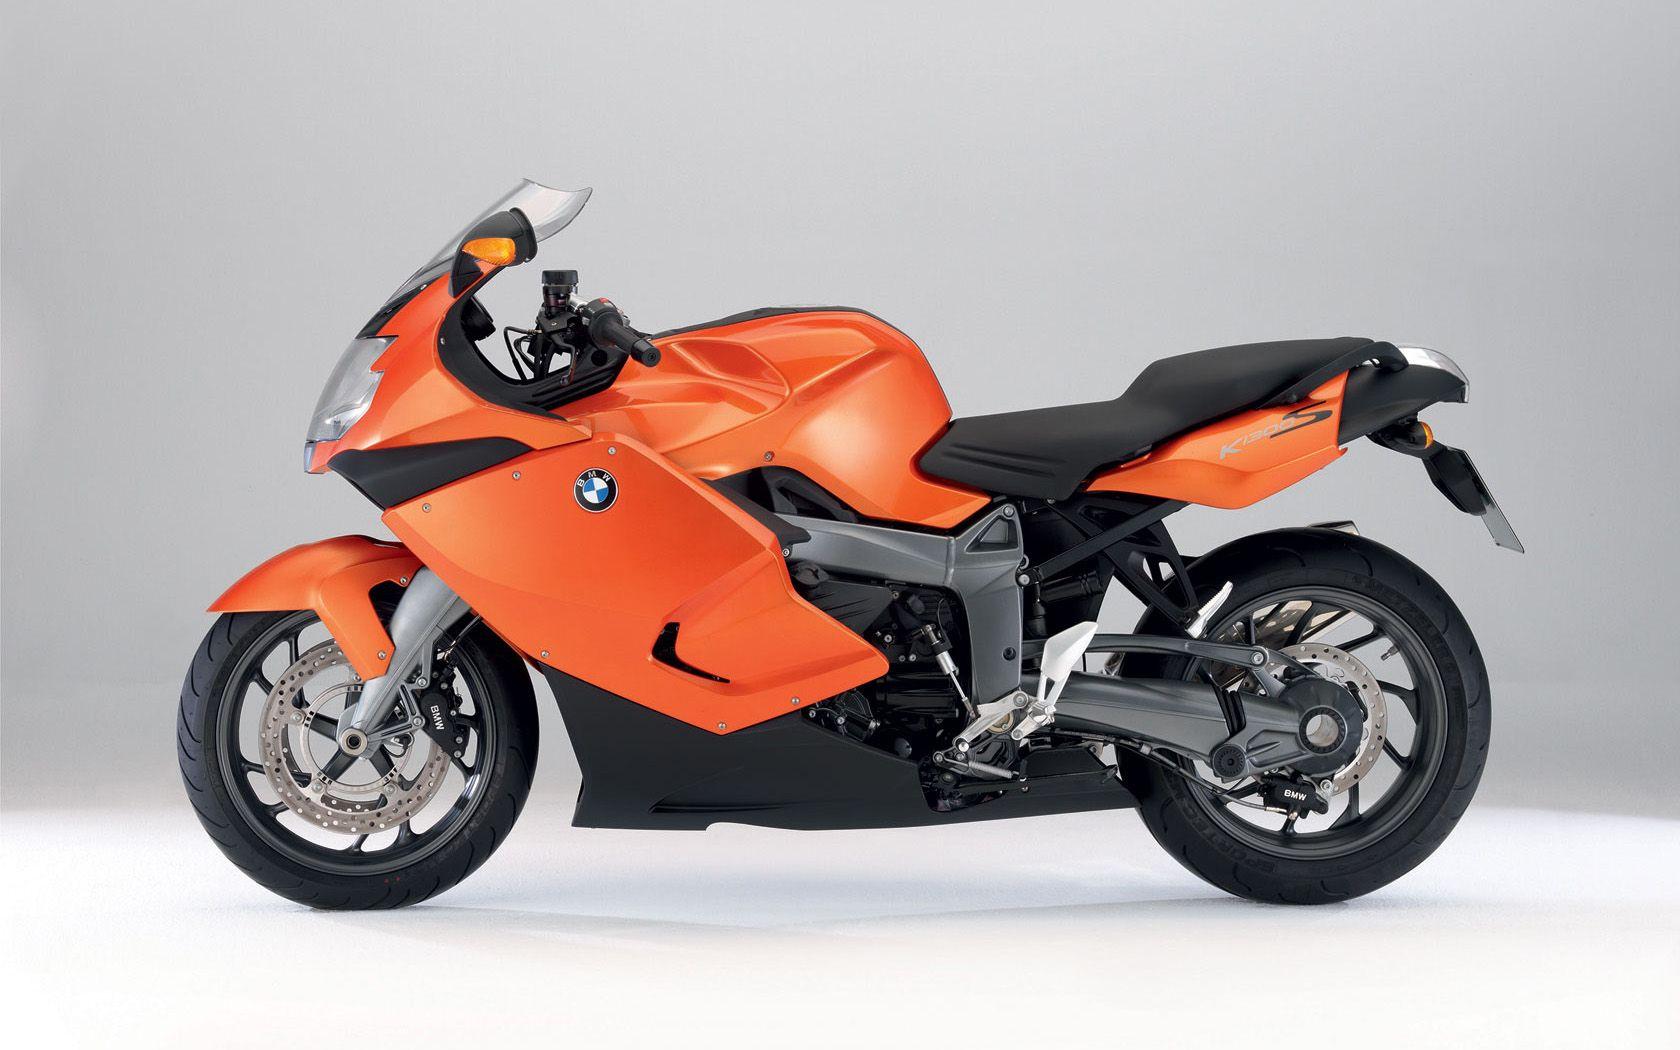 Bmw K1300s Motorcycle Fever Pinterest Motos Bmw And Motocicletas